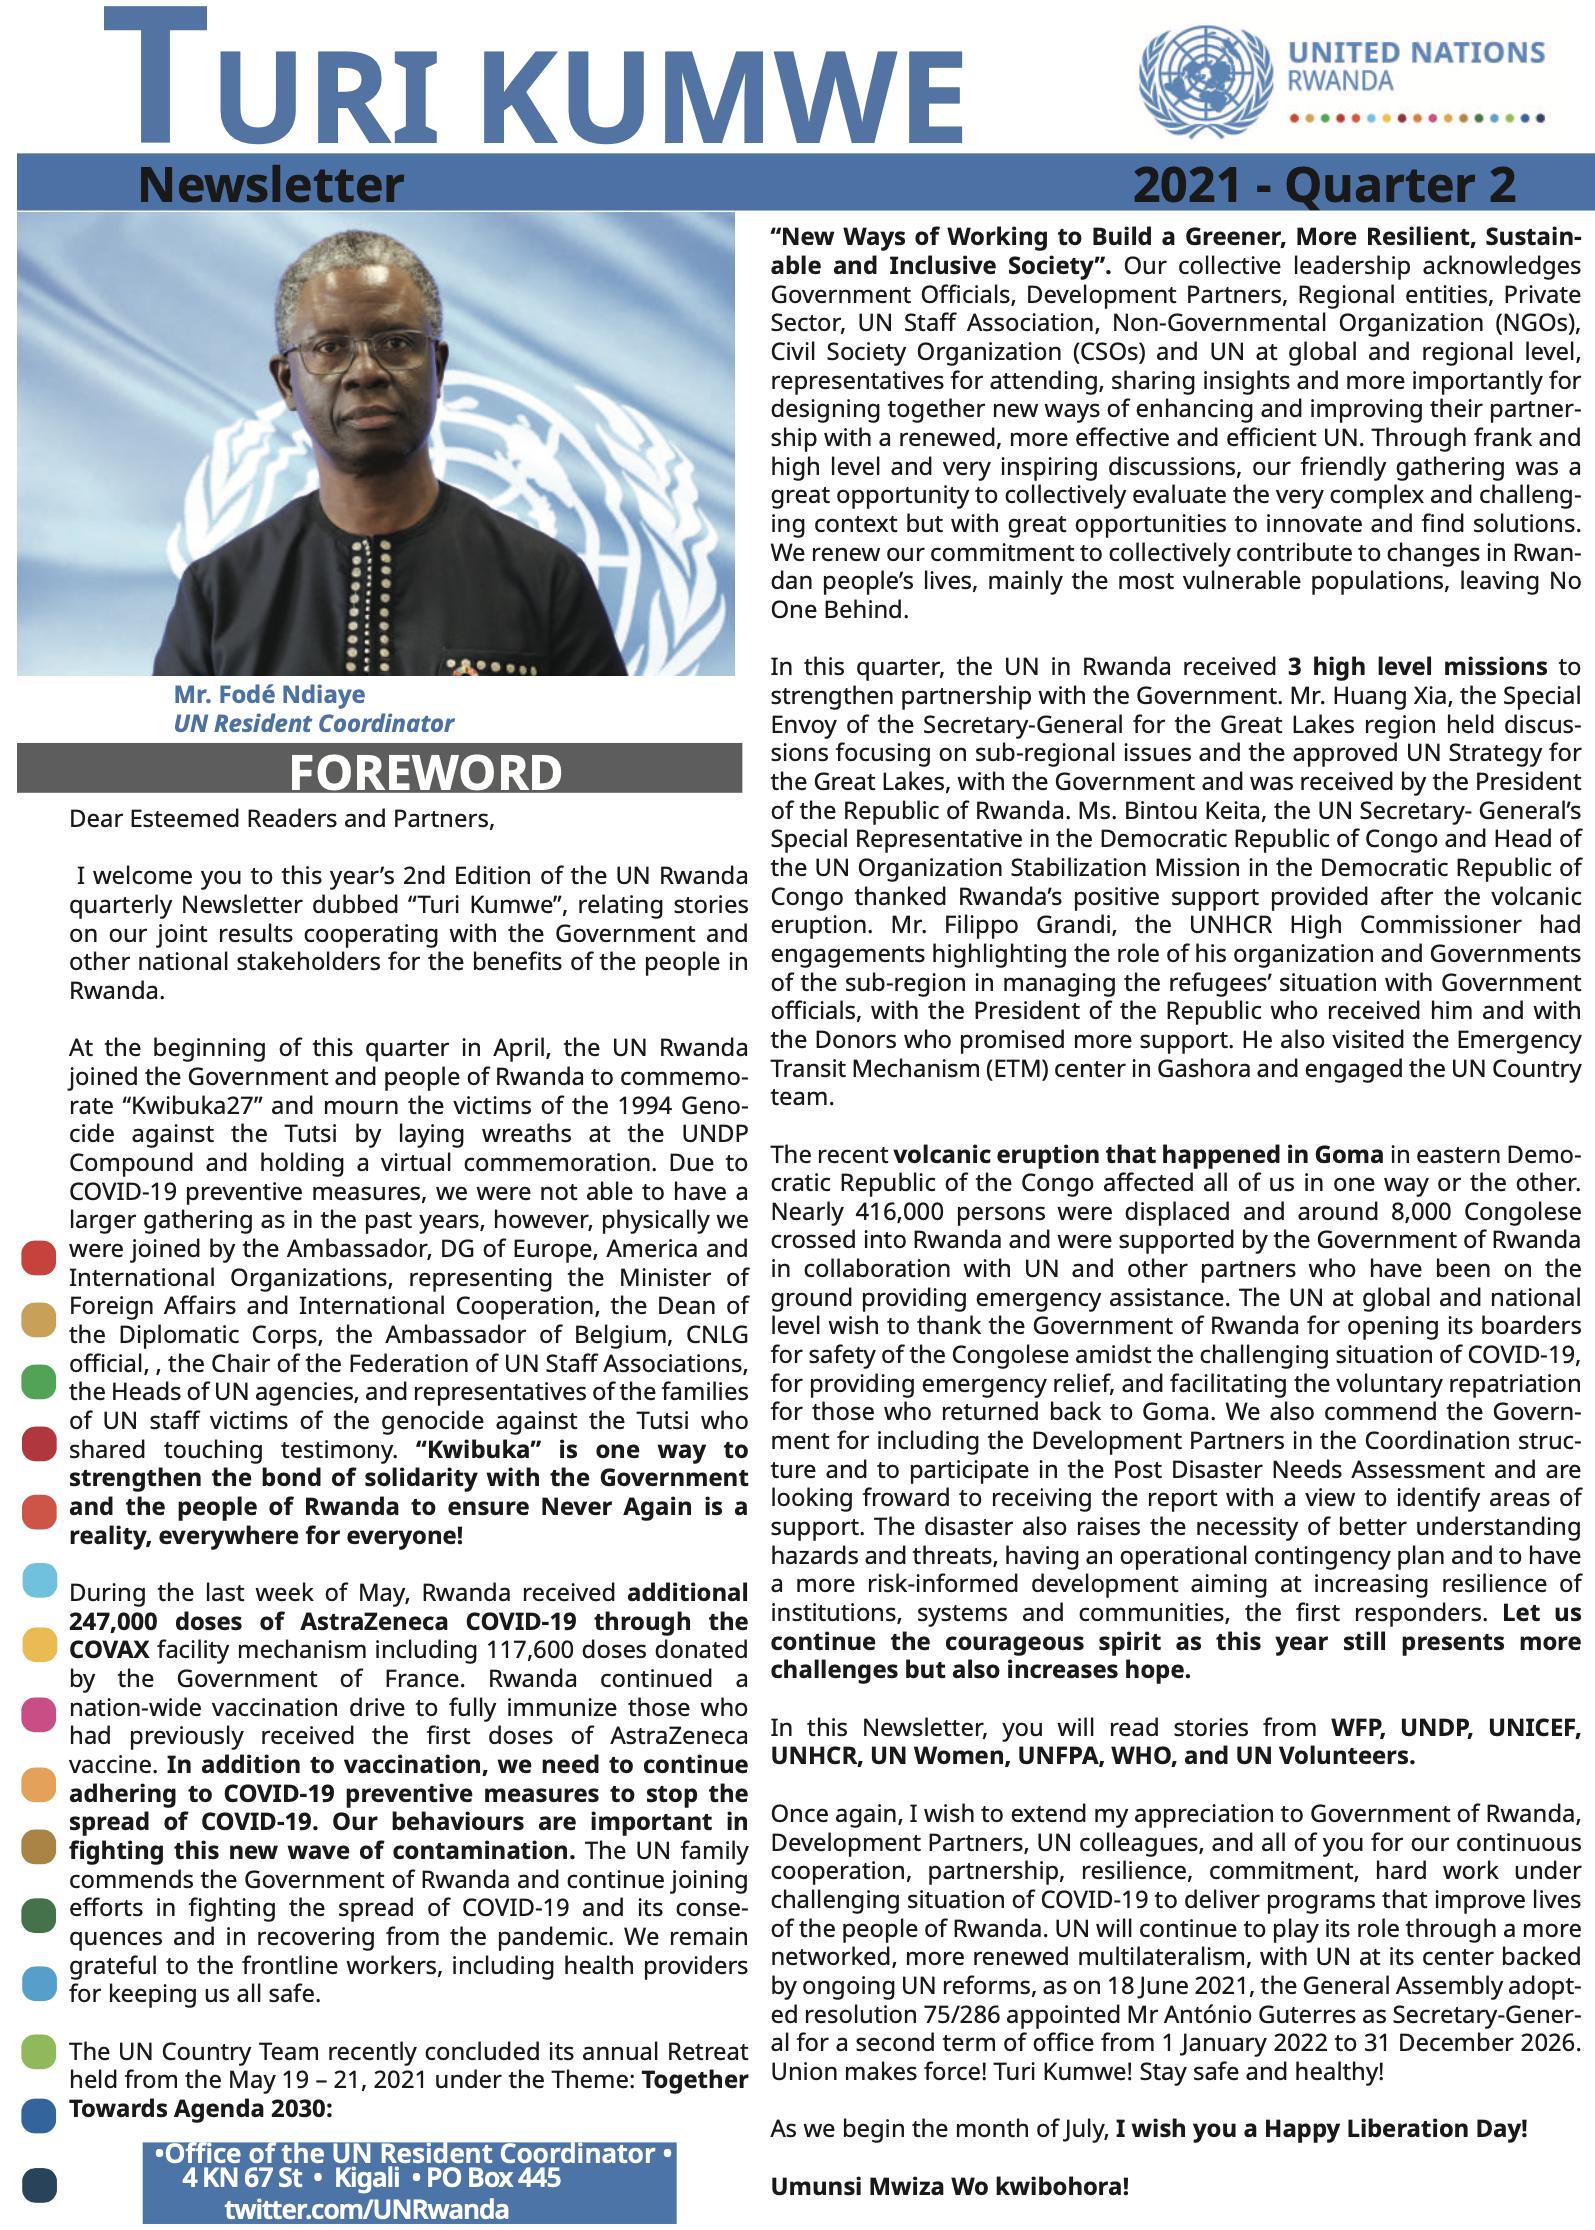 One UN Turi Kumwe Newsletter 2021 Quarter 2